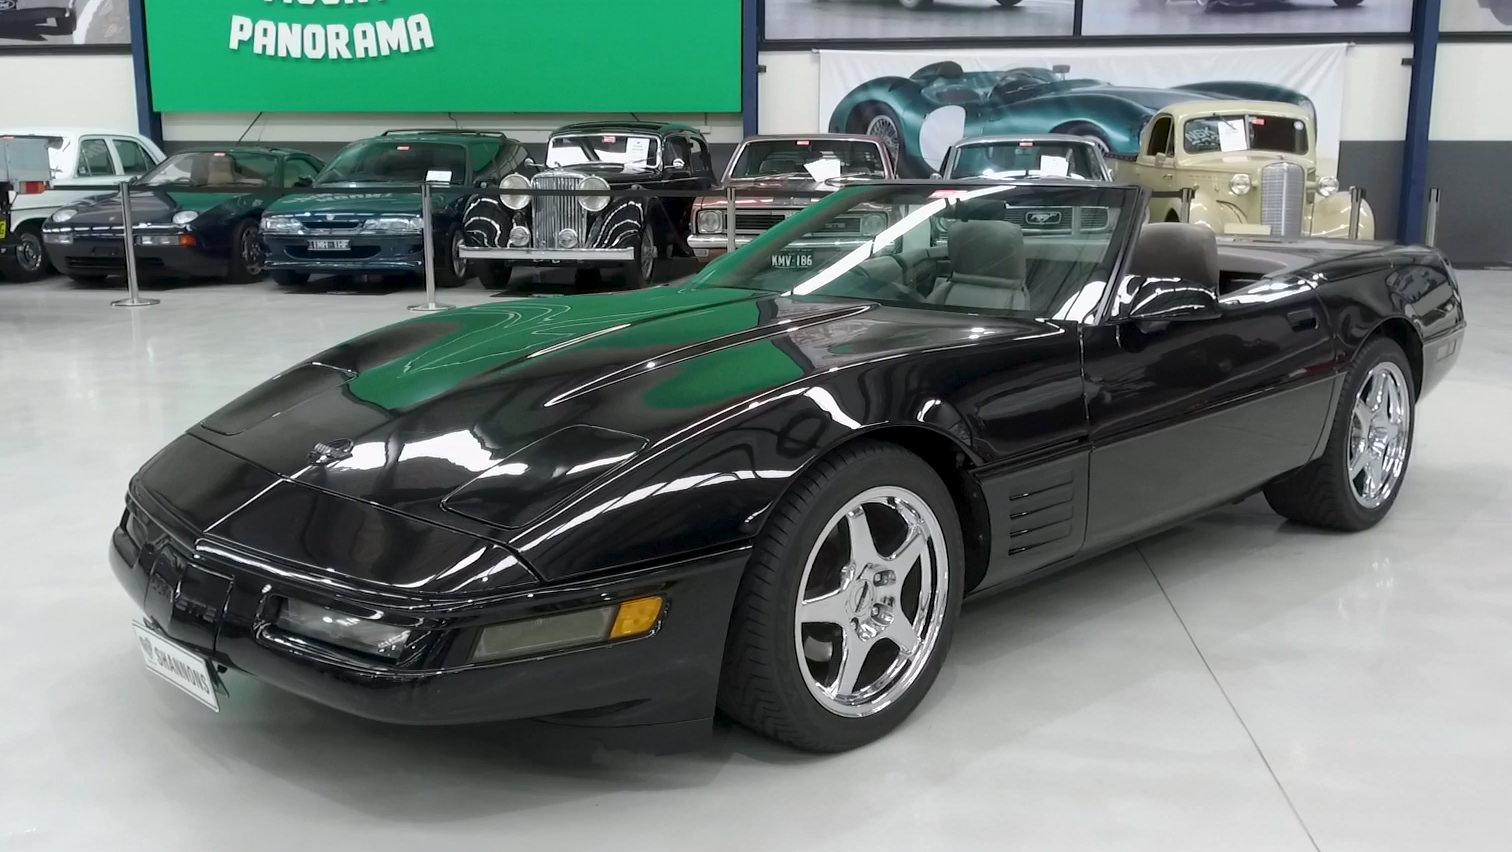 1991 Chevrolet Corvette Convertible (RHD) - 2021 Shannons Winter Timed Online Auction